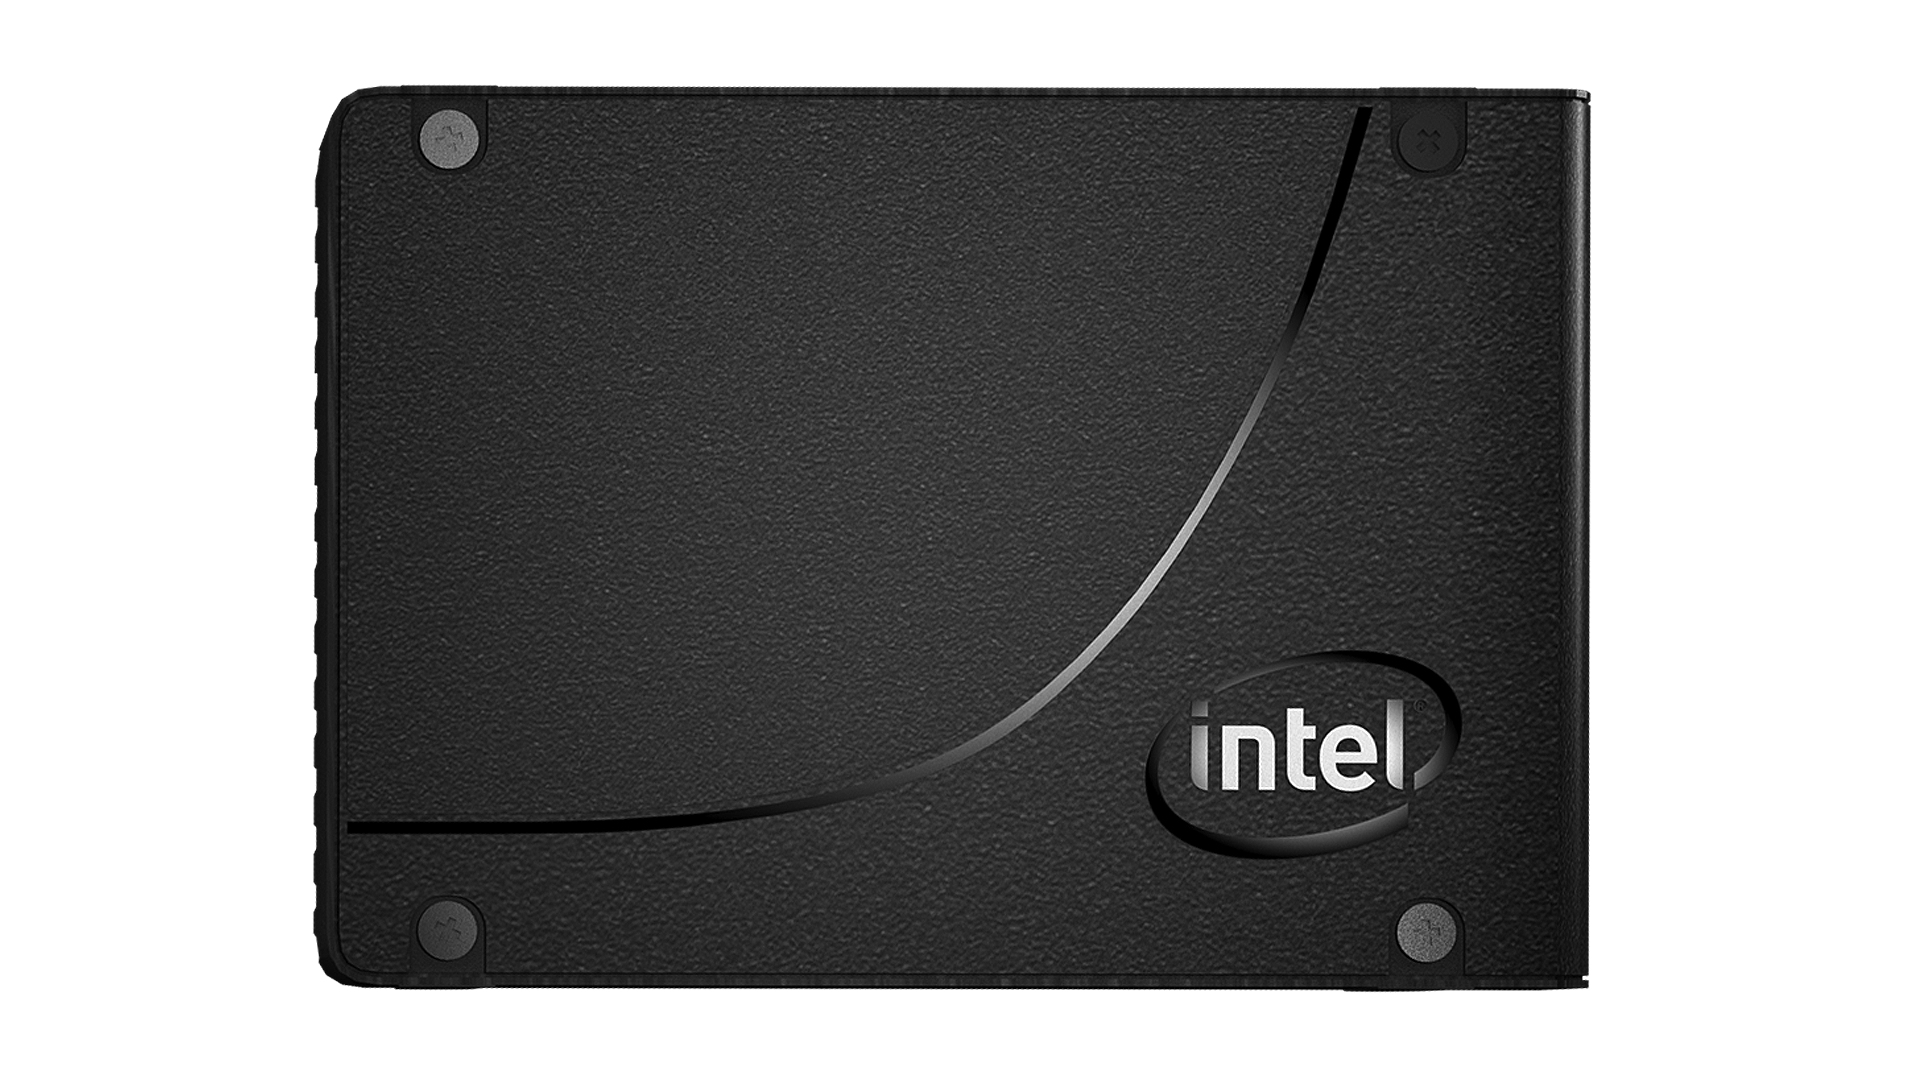 Intel Optane MDTPE21K750GA01 unidad de estado sólido U.2 750 GB PCI Express 3.0 3D XPoint NVMe